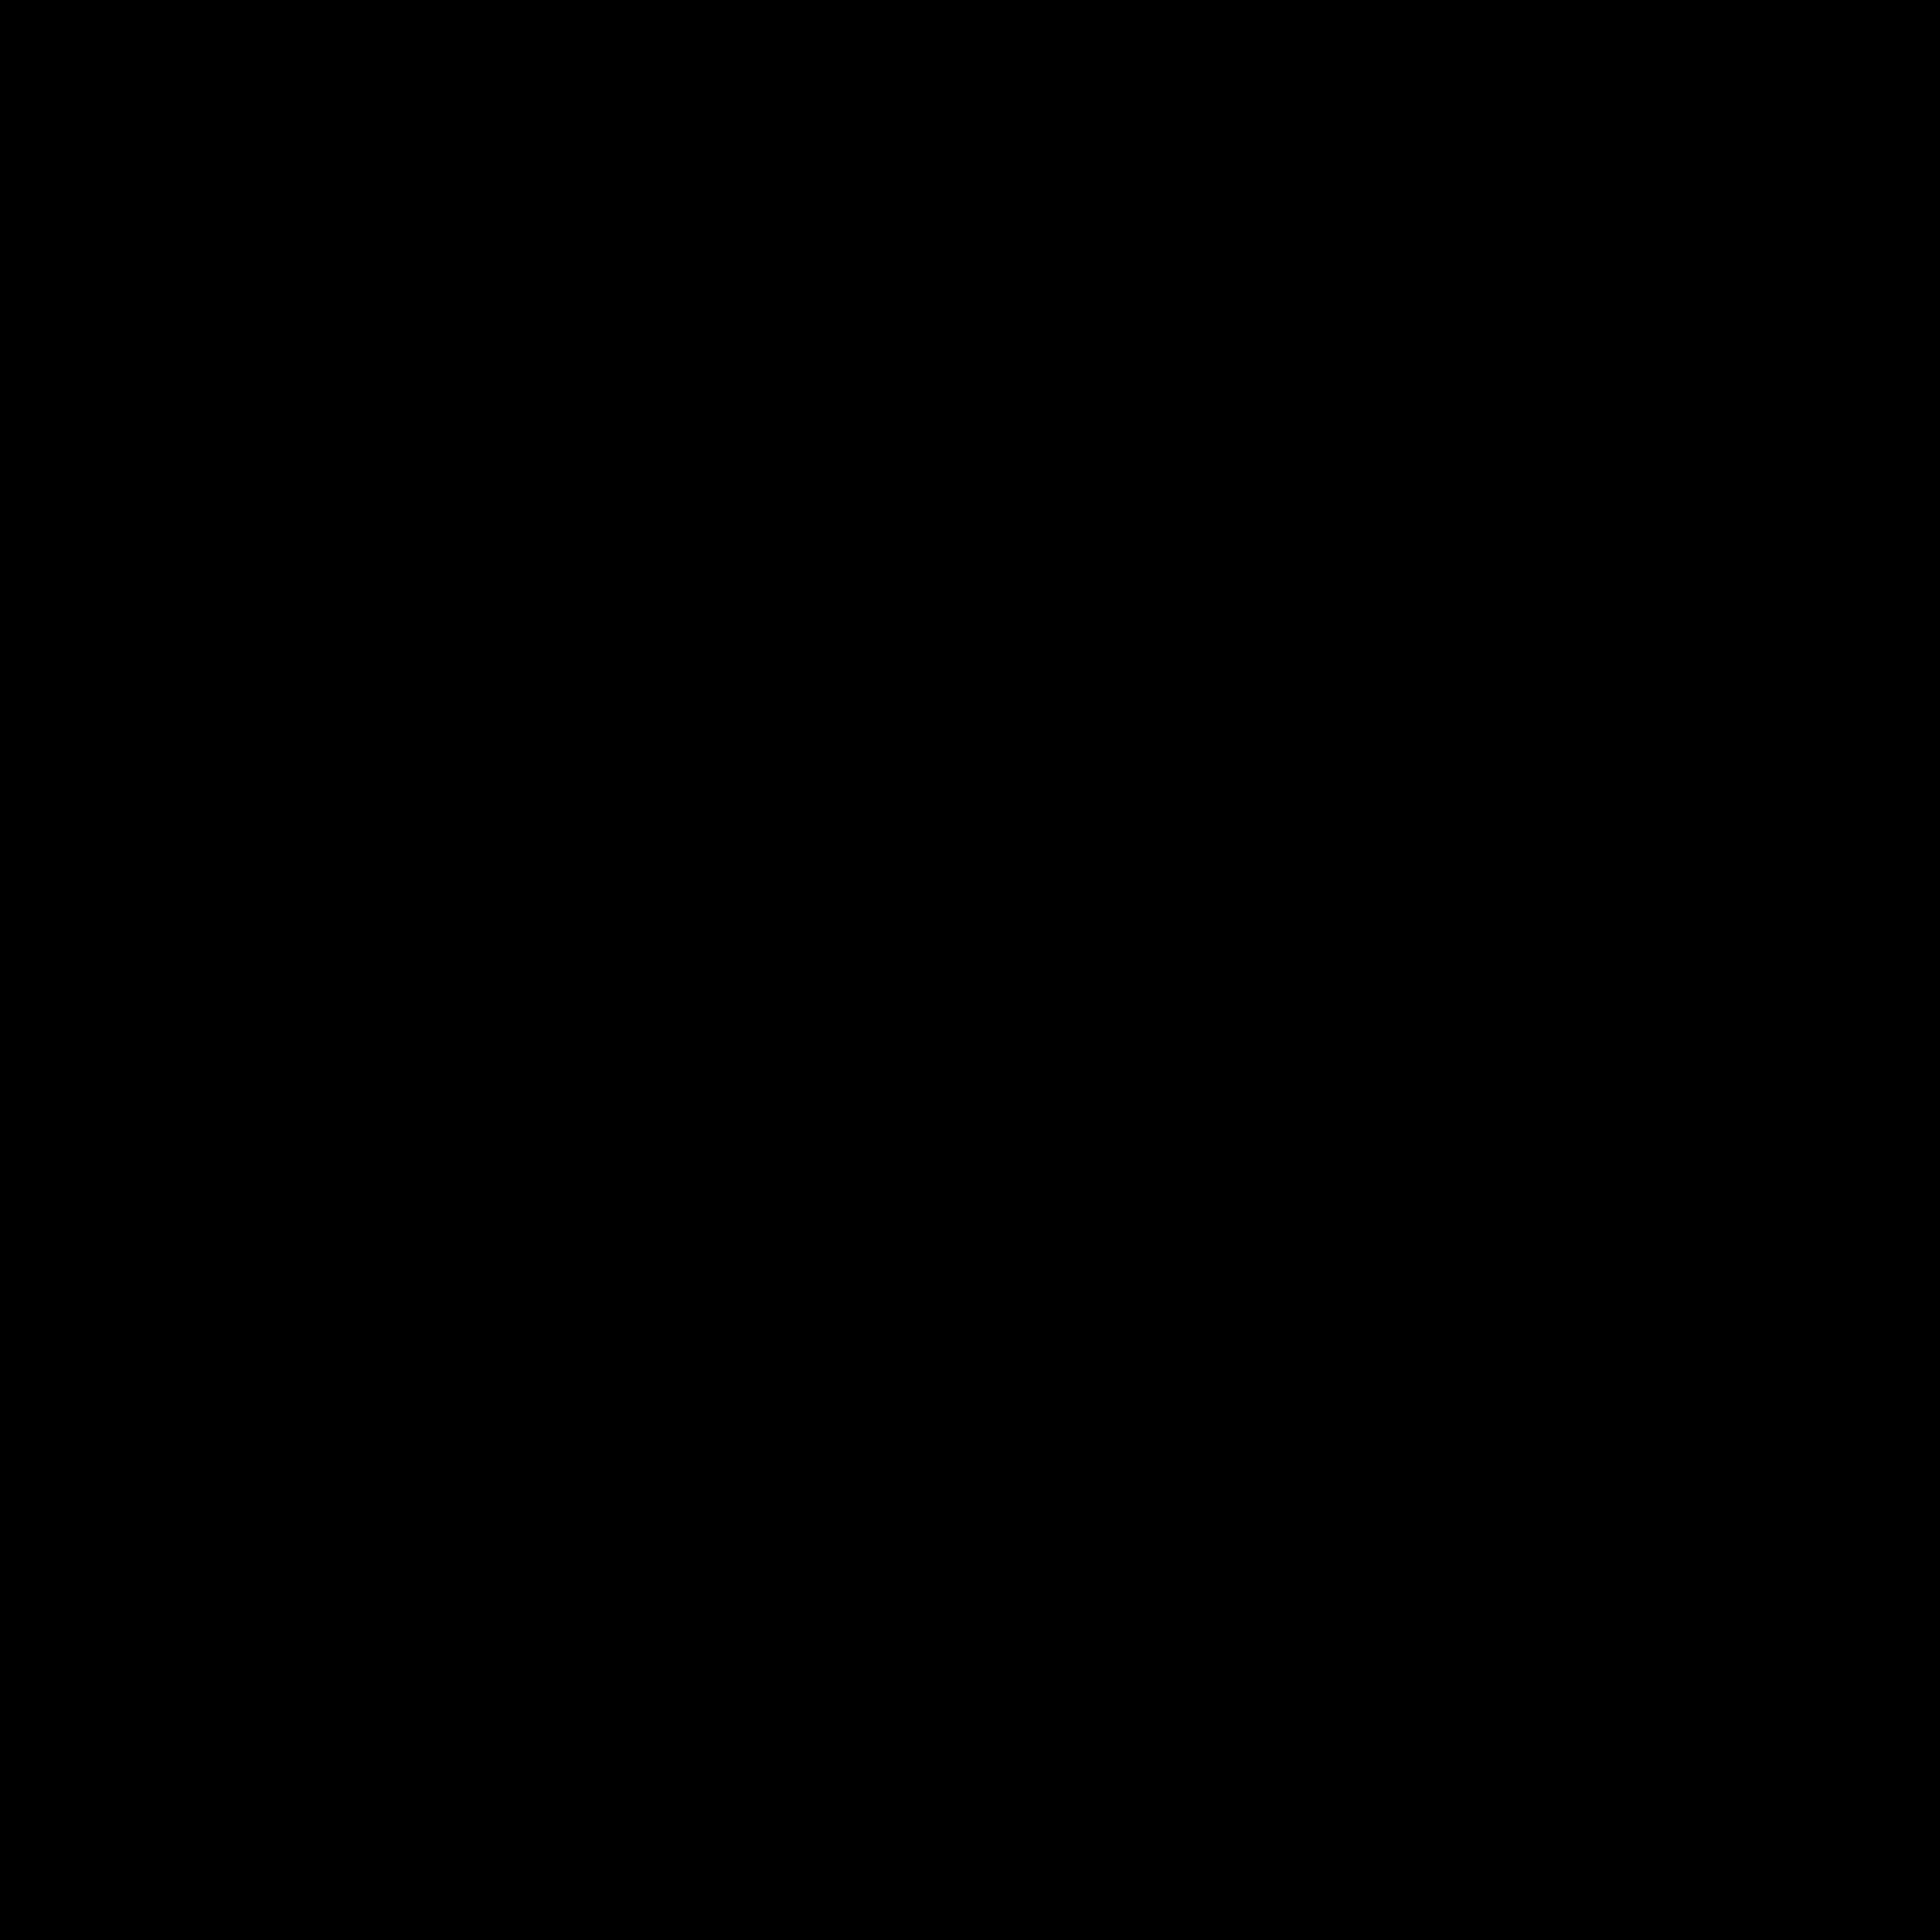 Trinity (icon)